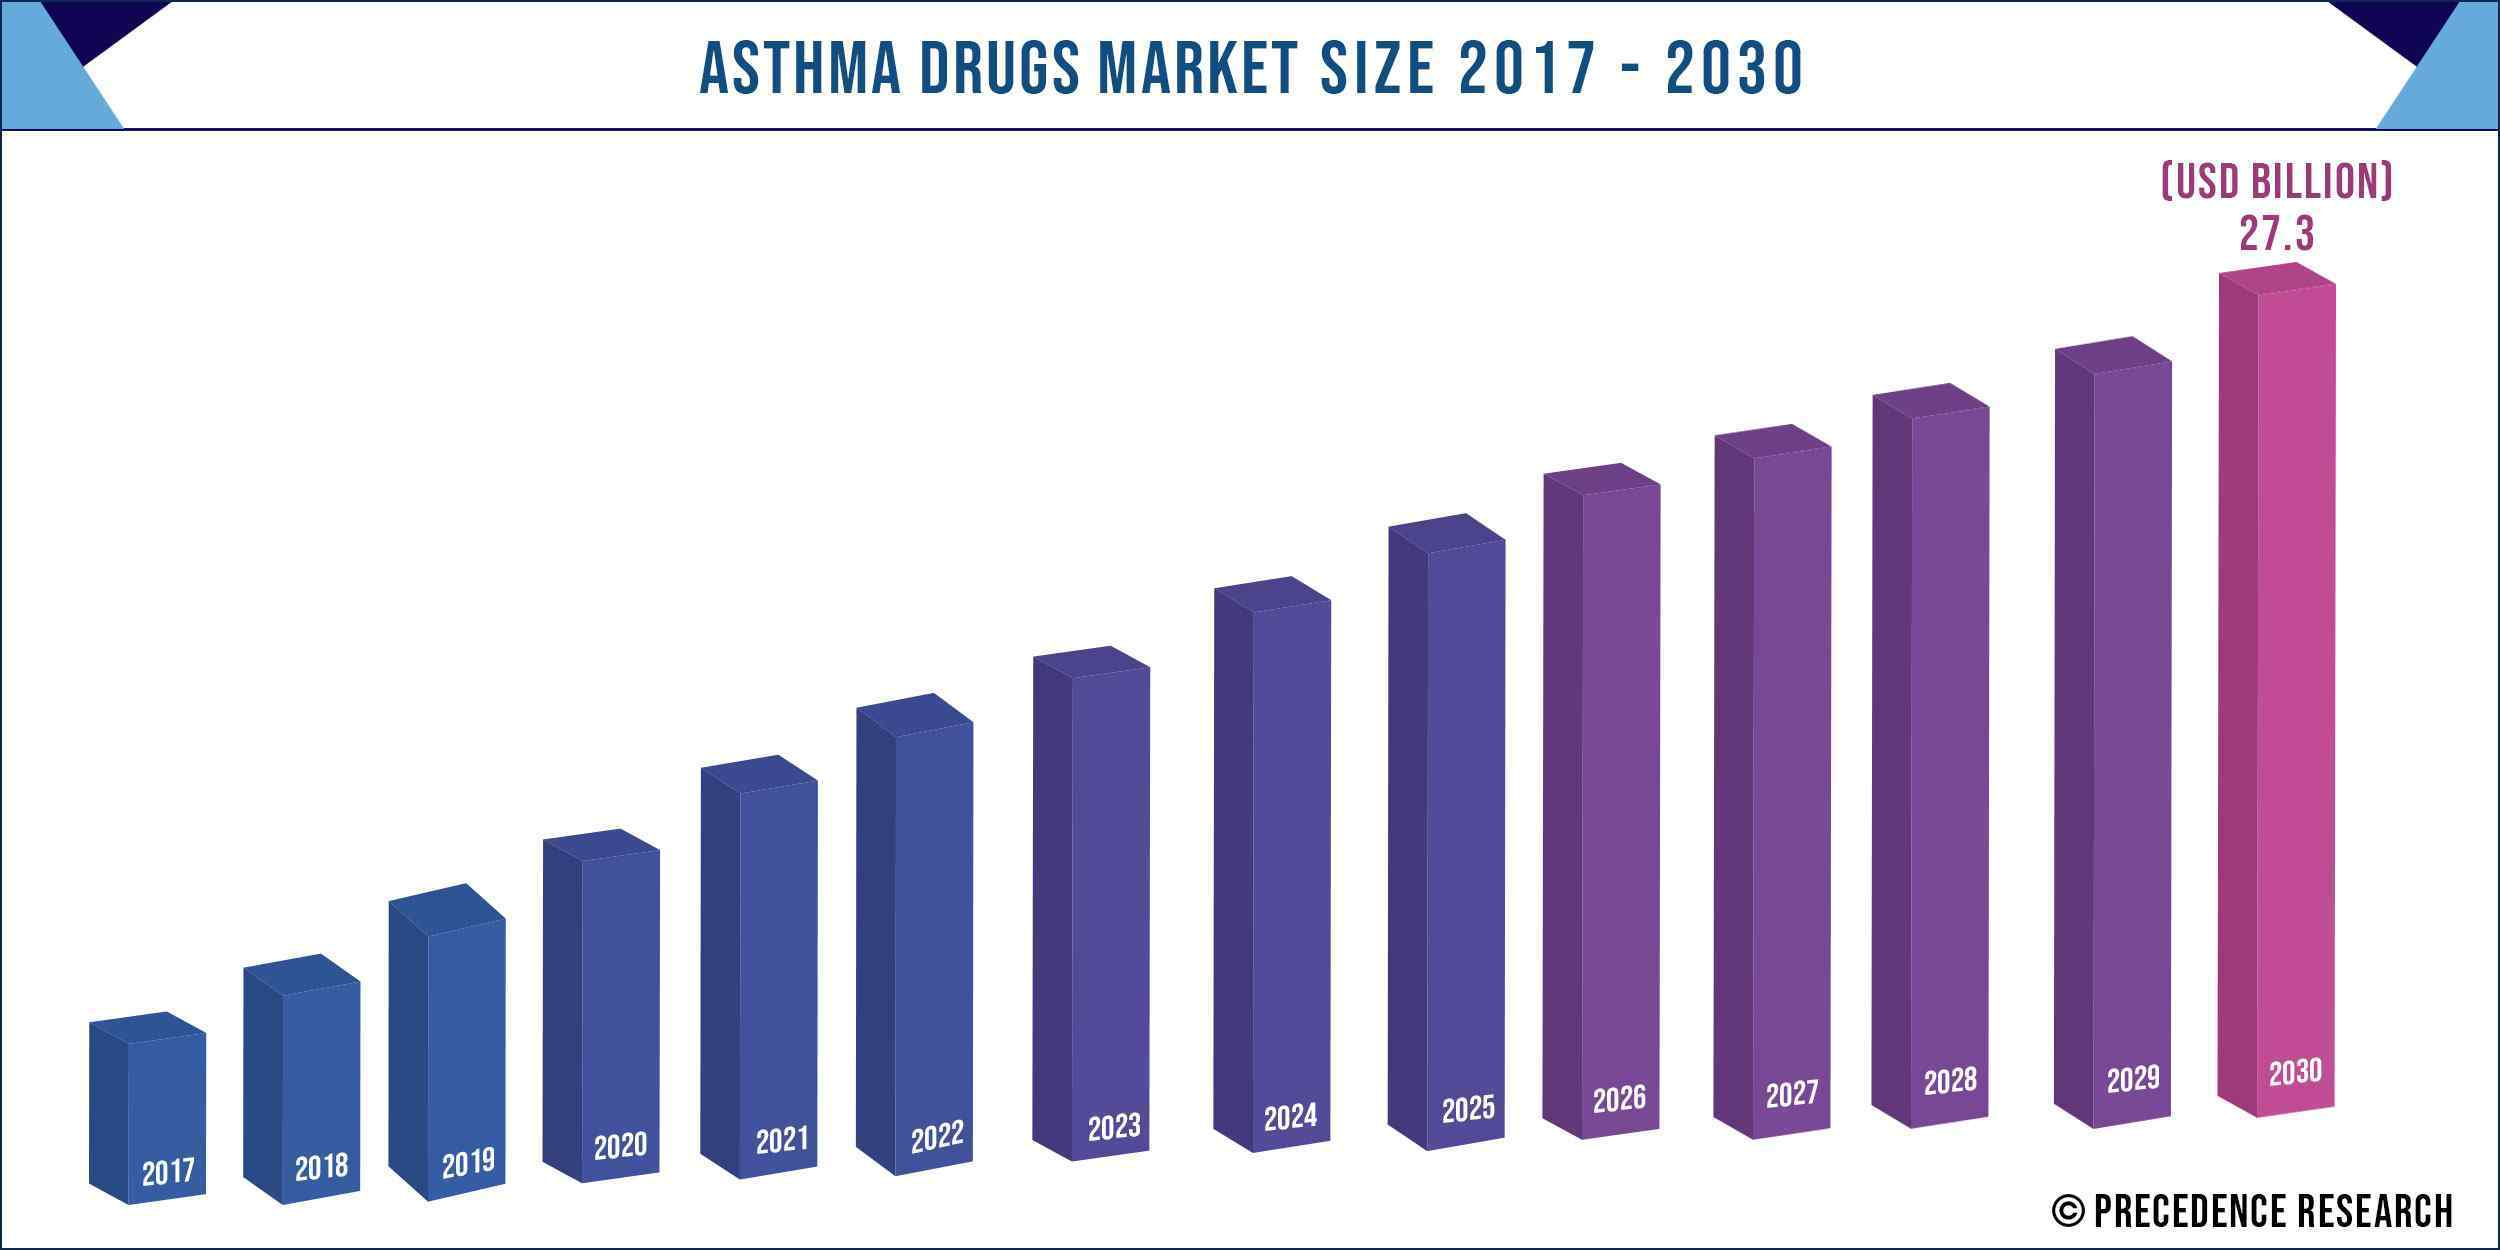 Asthma Drugs Market Size 2017-2030